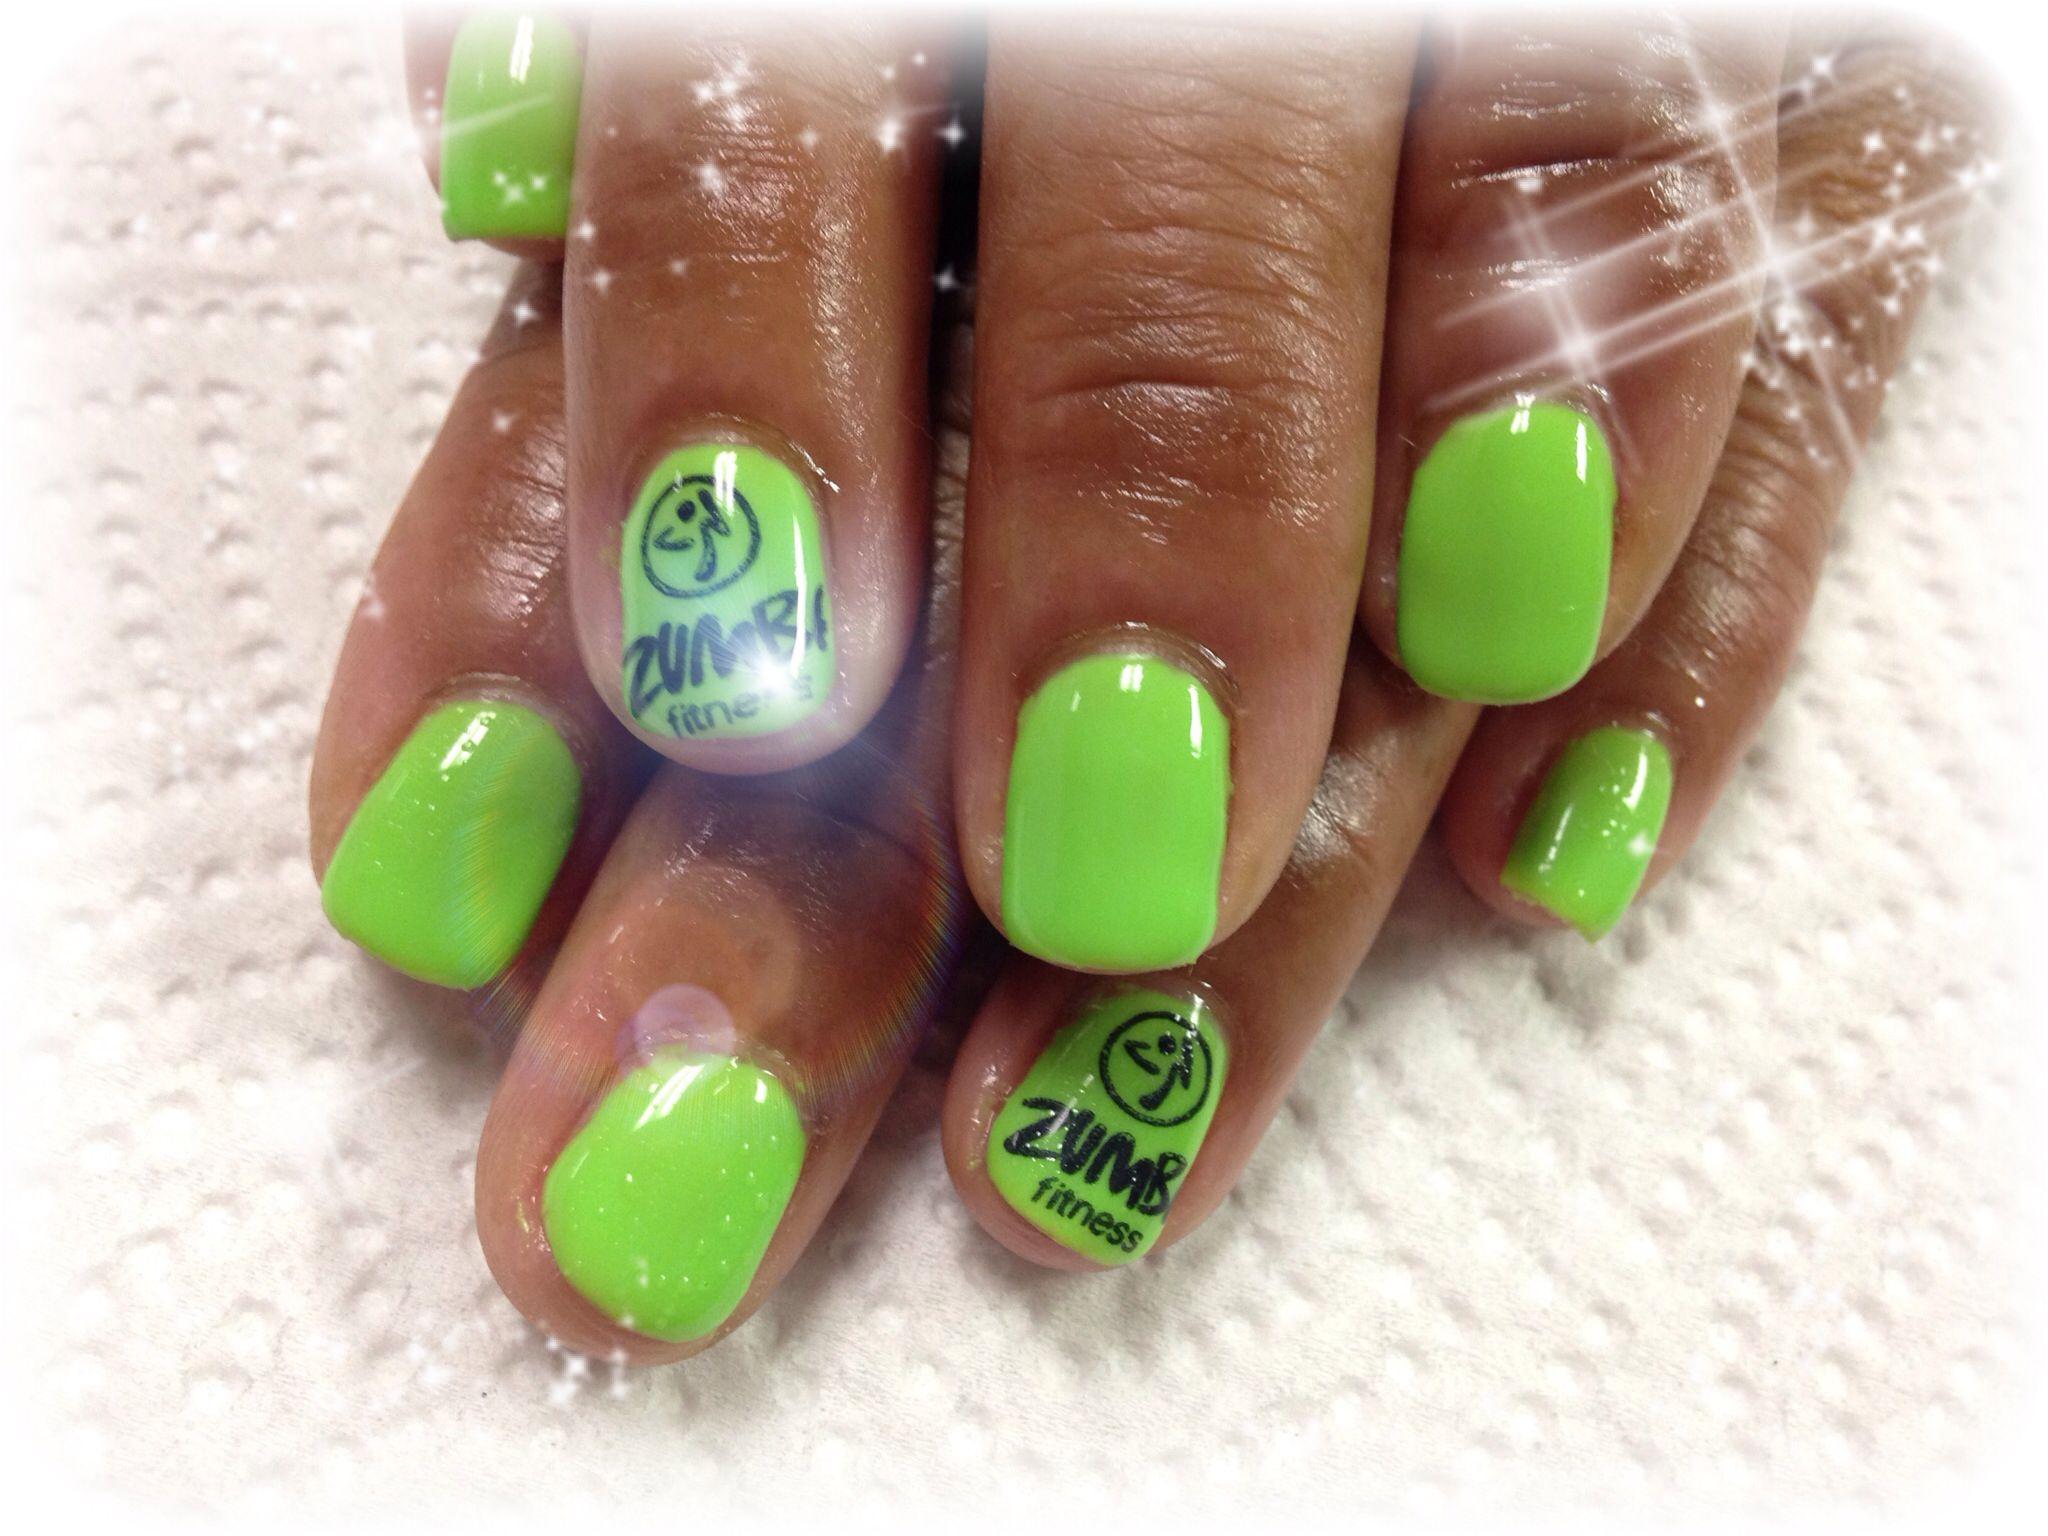 Zumba nails | Nails <3 | Pinterest